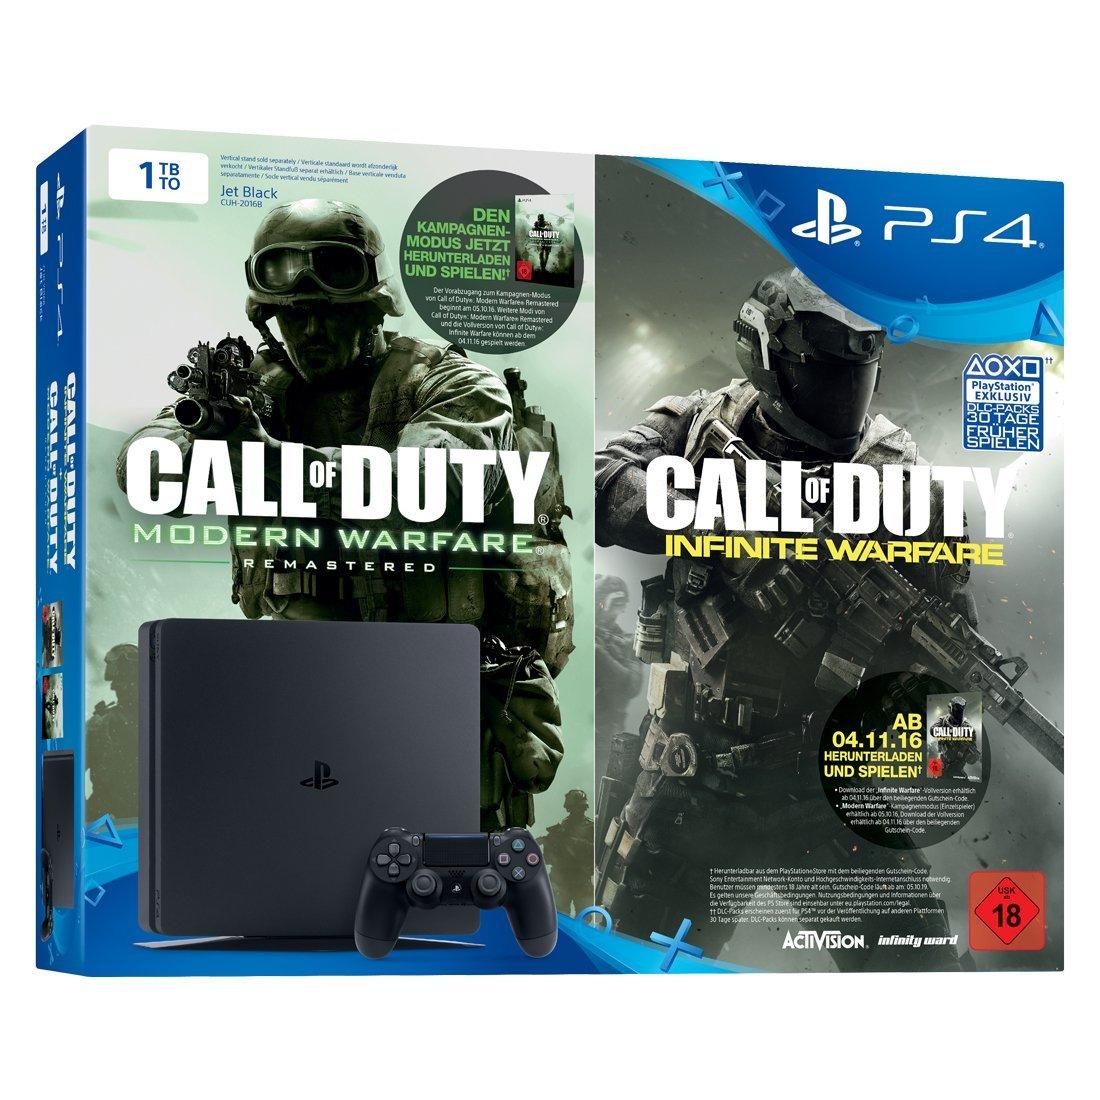 PS4 Slim 1TB + CoD: Infinite Warfare Legacy Edition (Infinite Warfare + Modern Warfare: Remastered) für 234€ [Amazon]